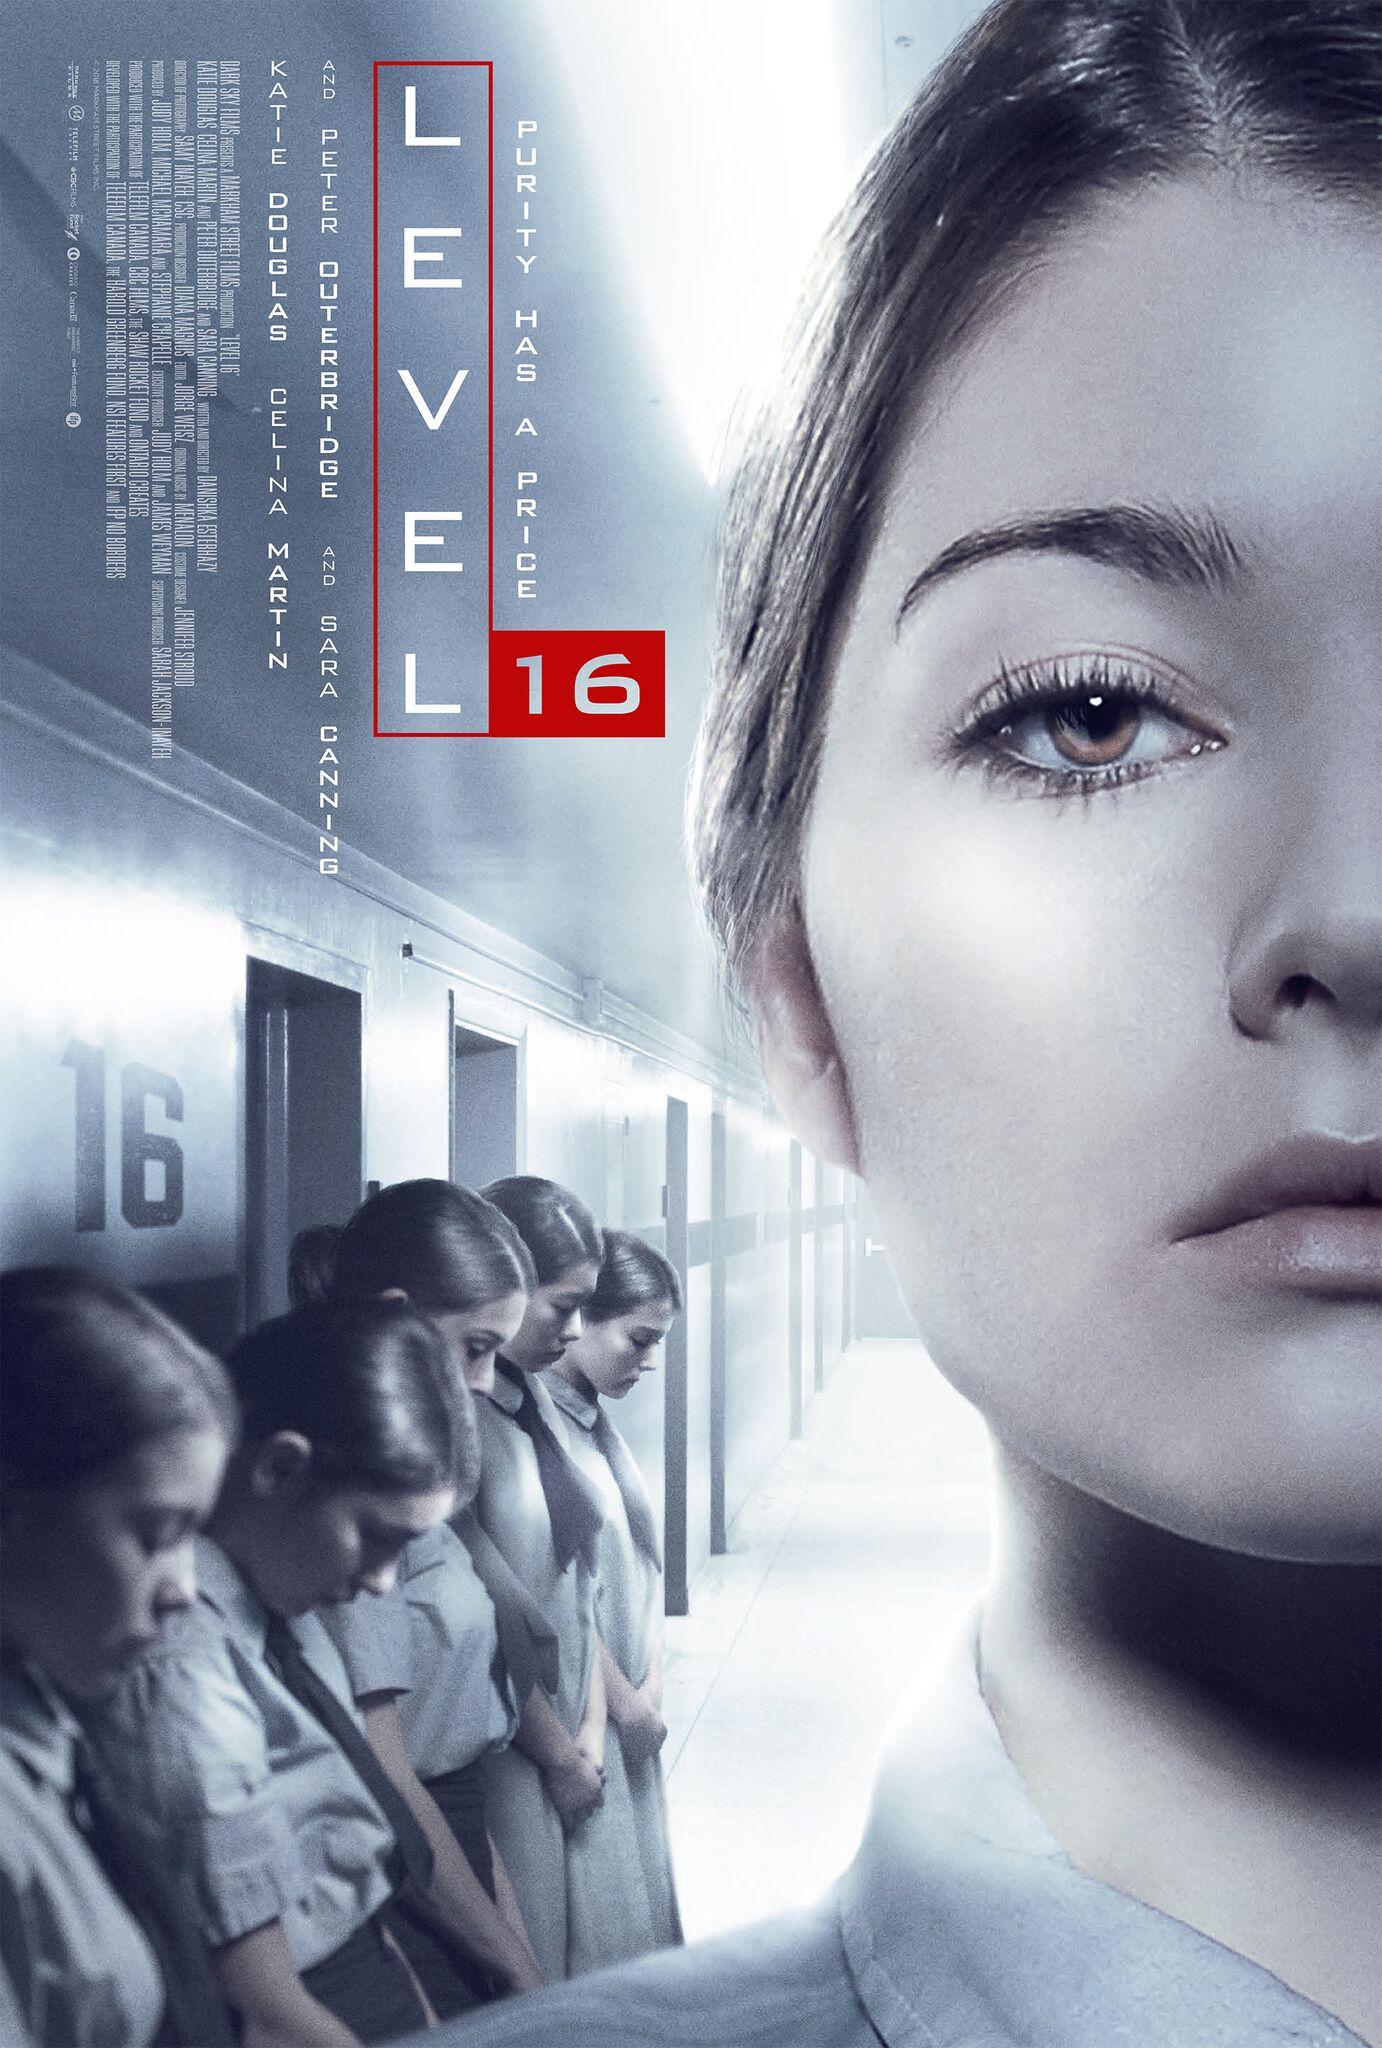 Level 16 (2018) Telugu Dubbed (Voice Over) & English [Dual Audio] BDRip 720p [1XBET]